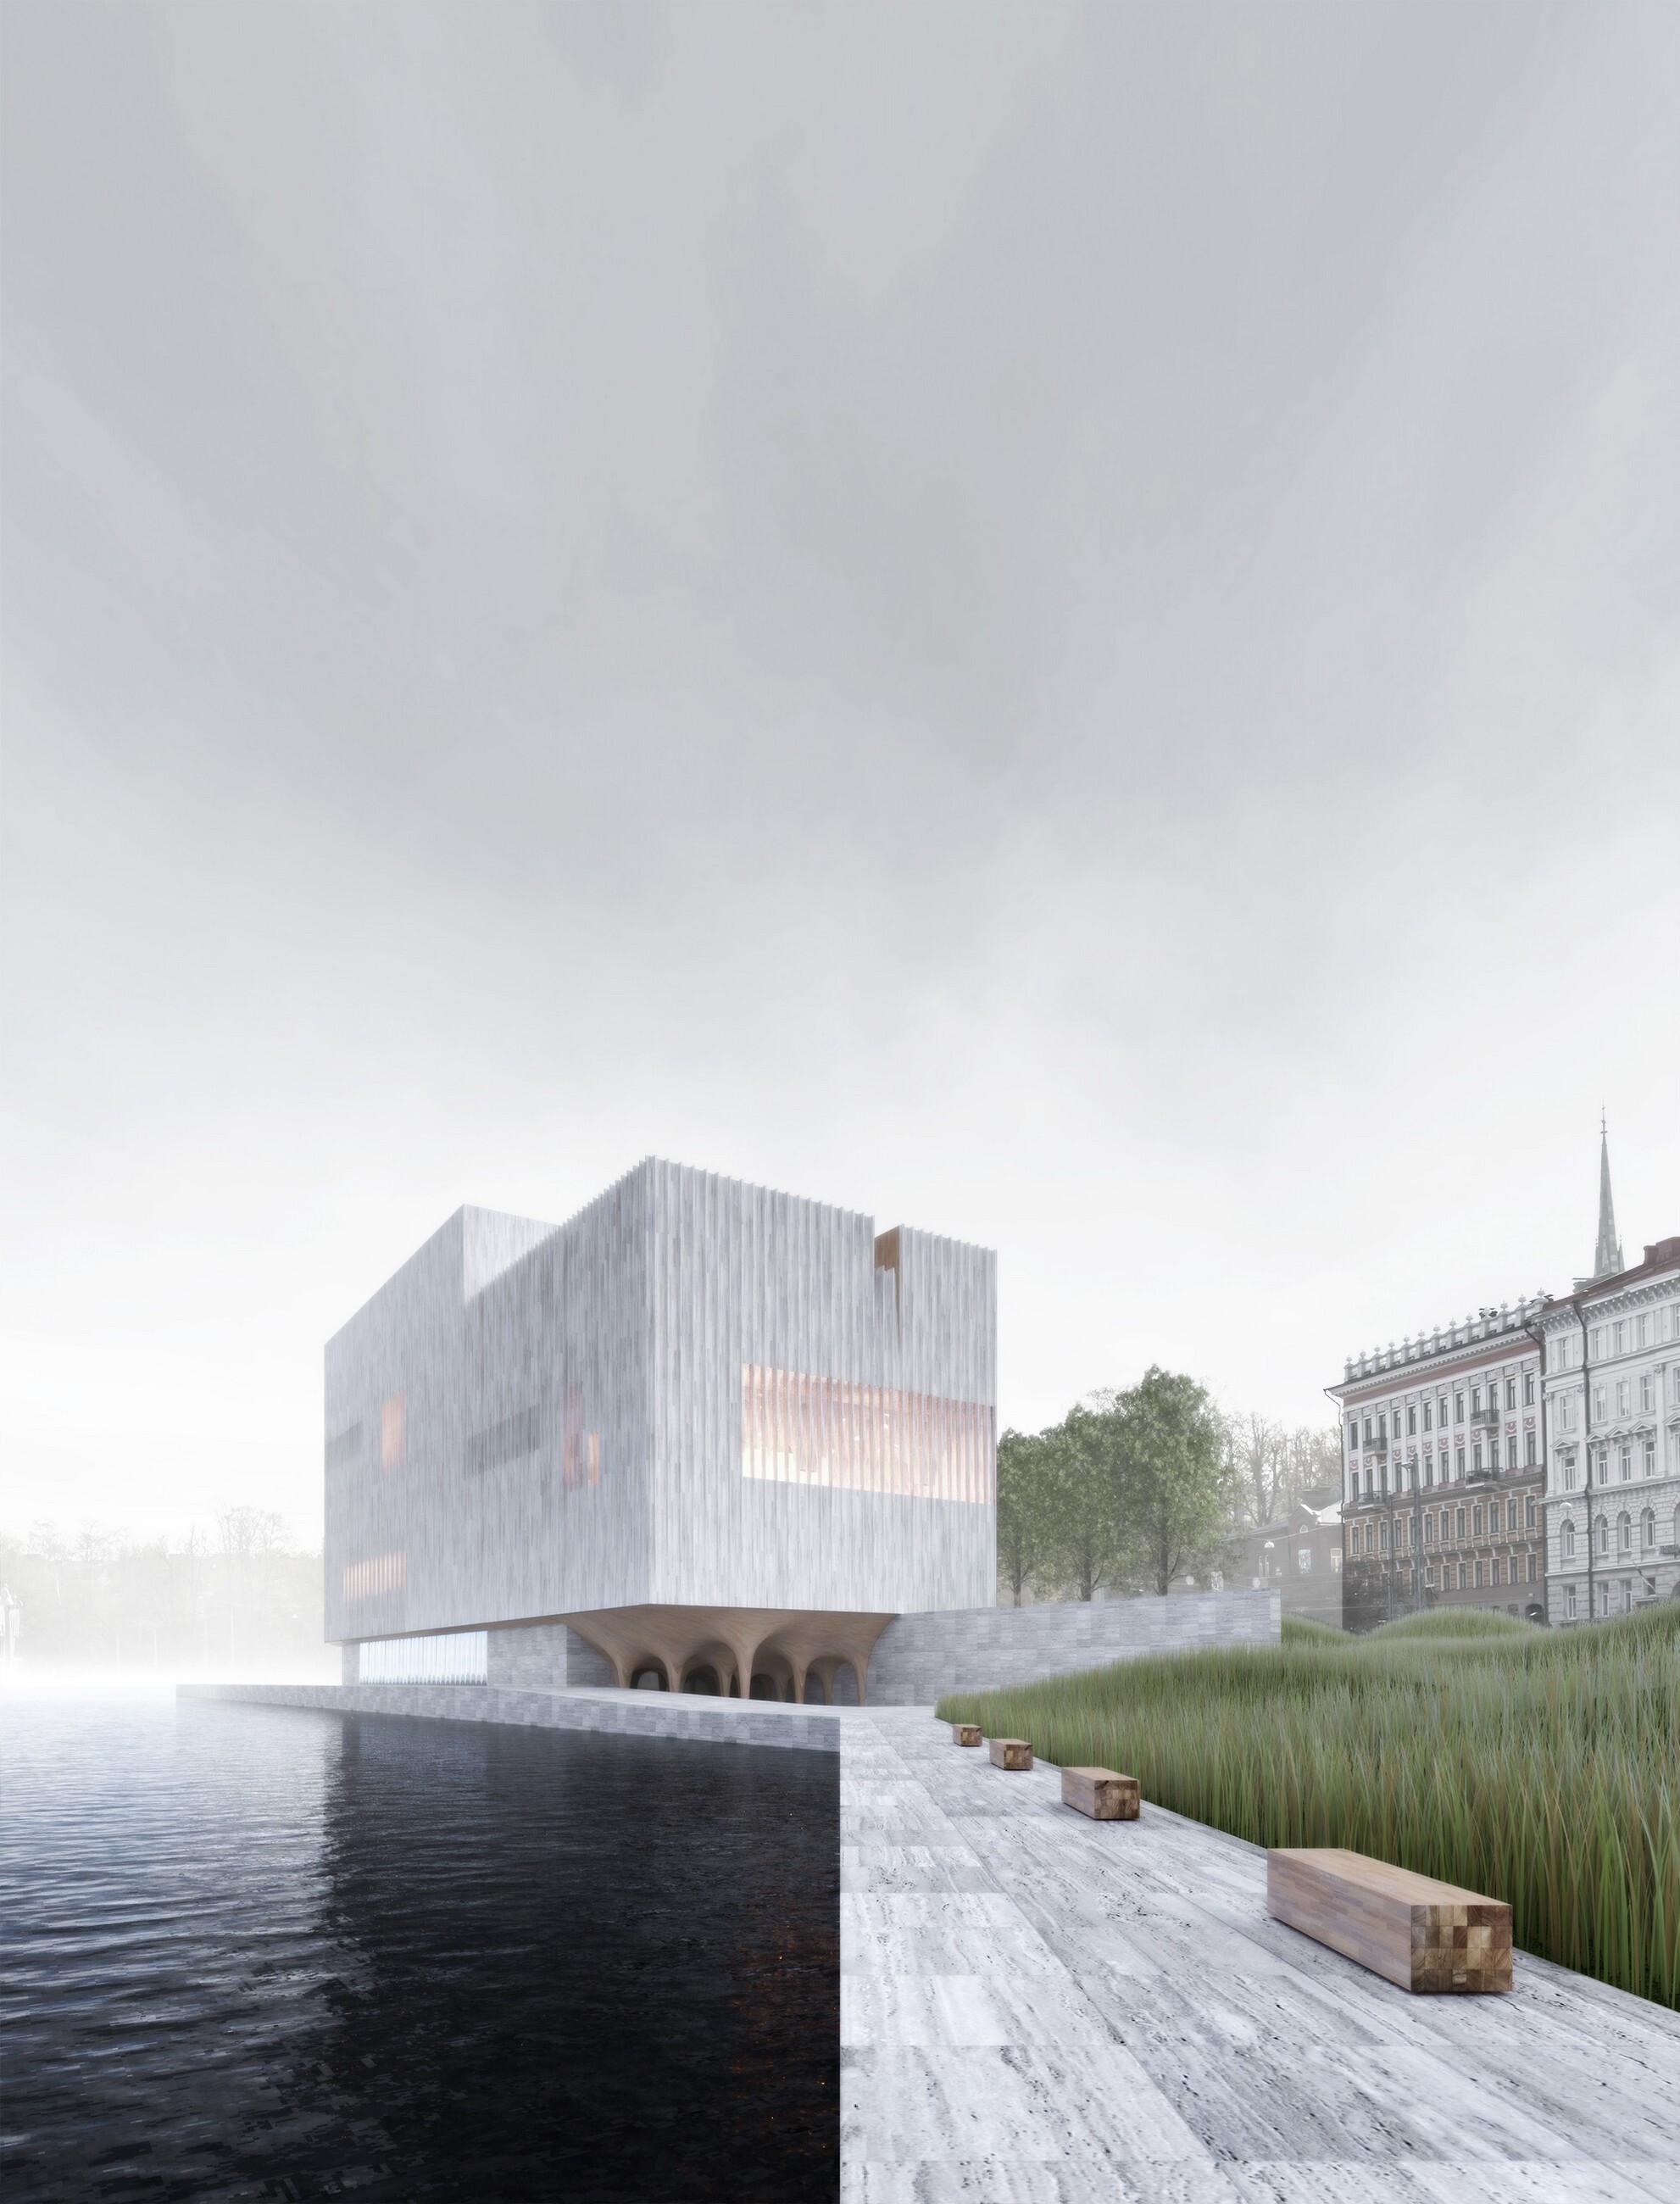 Guggenheim Helsinki: Social Aeration